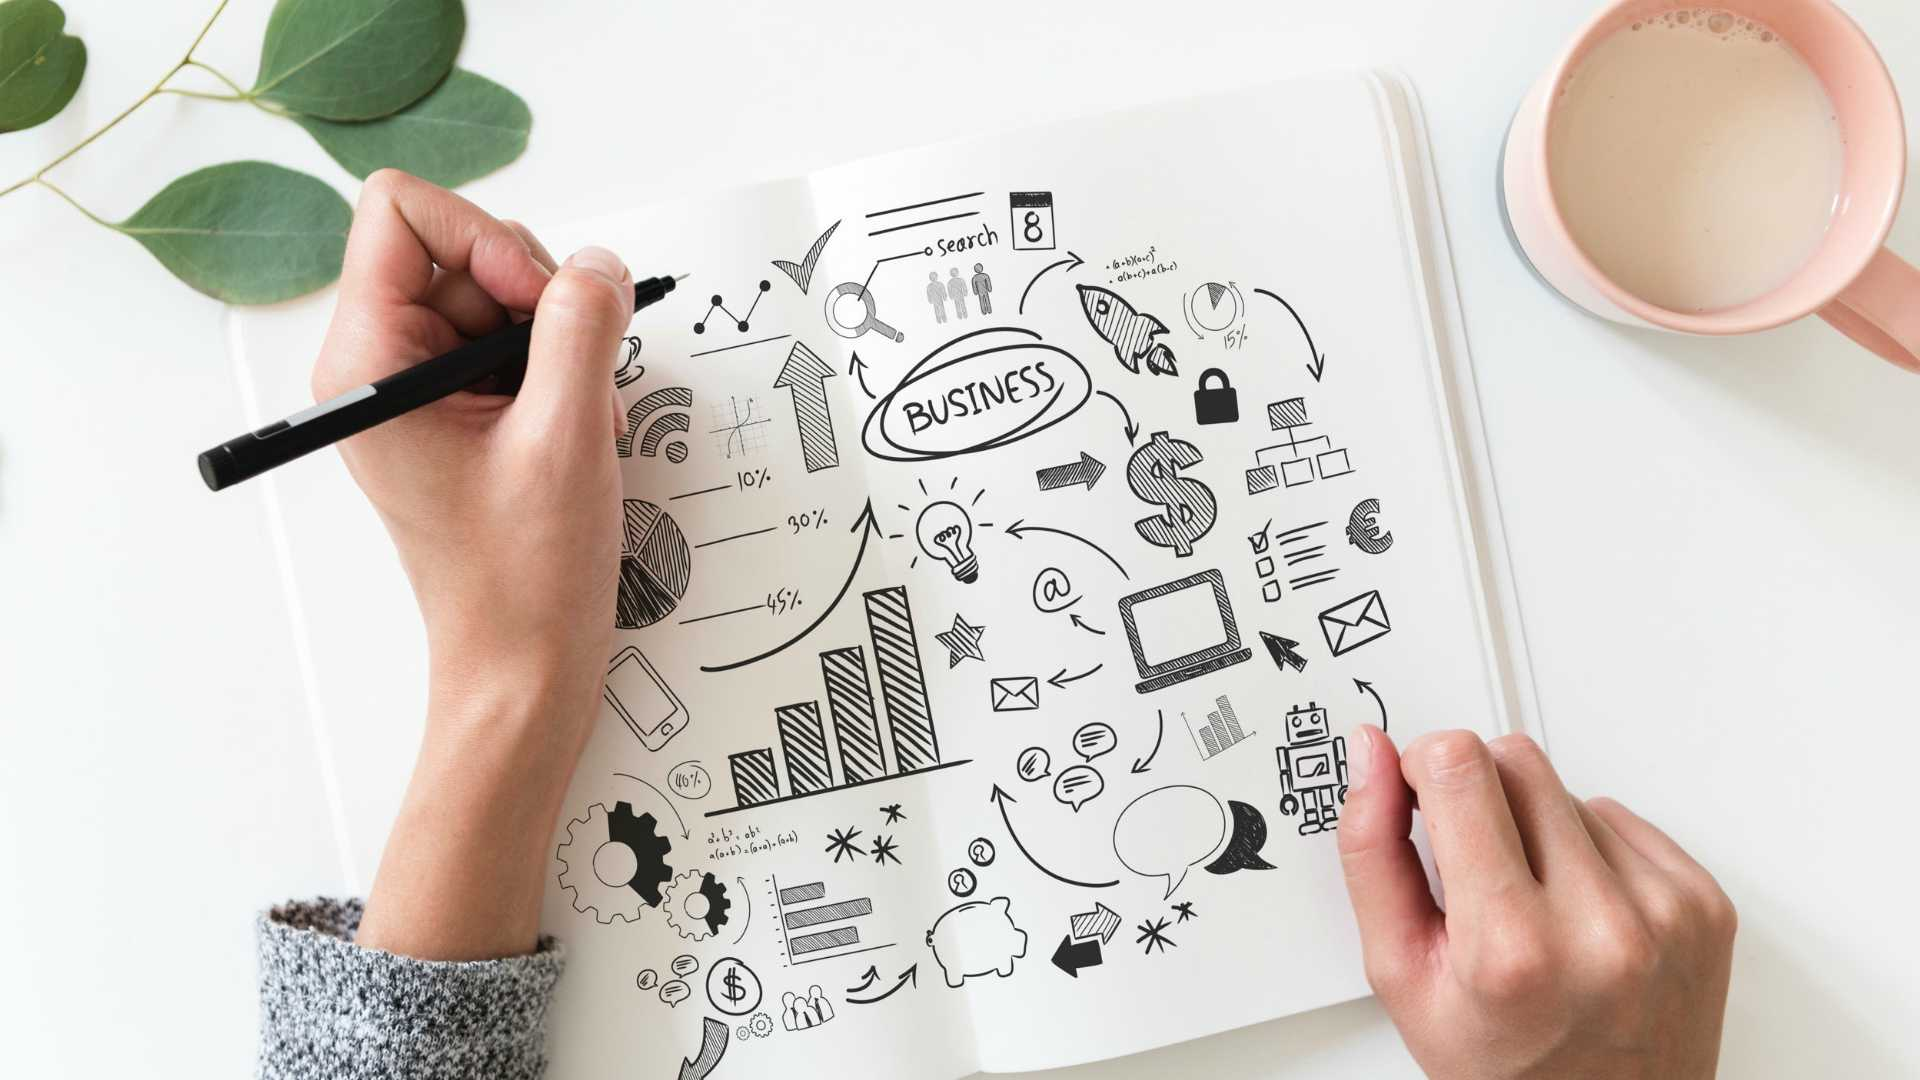 Building Better Business Acumen Training Industry